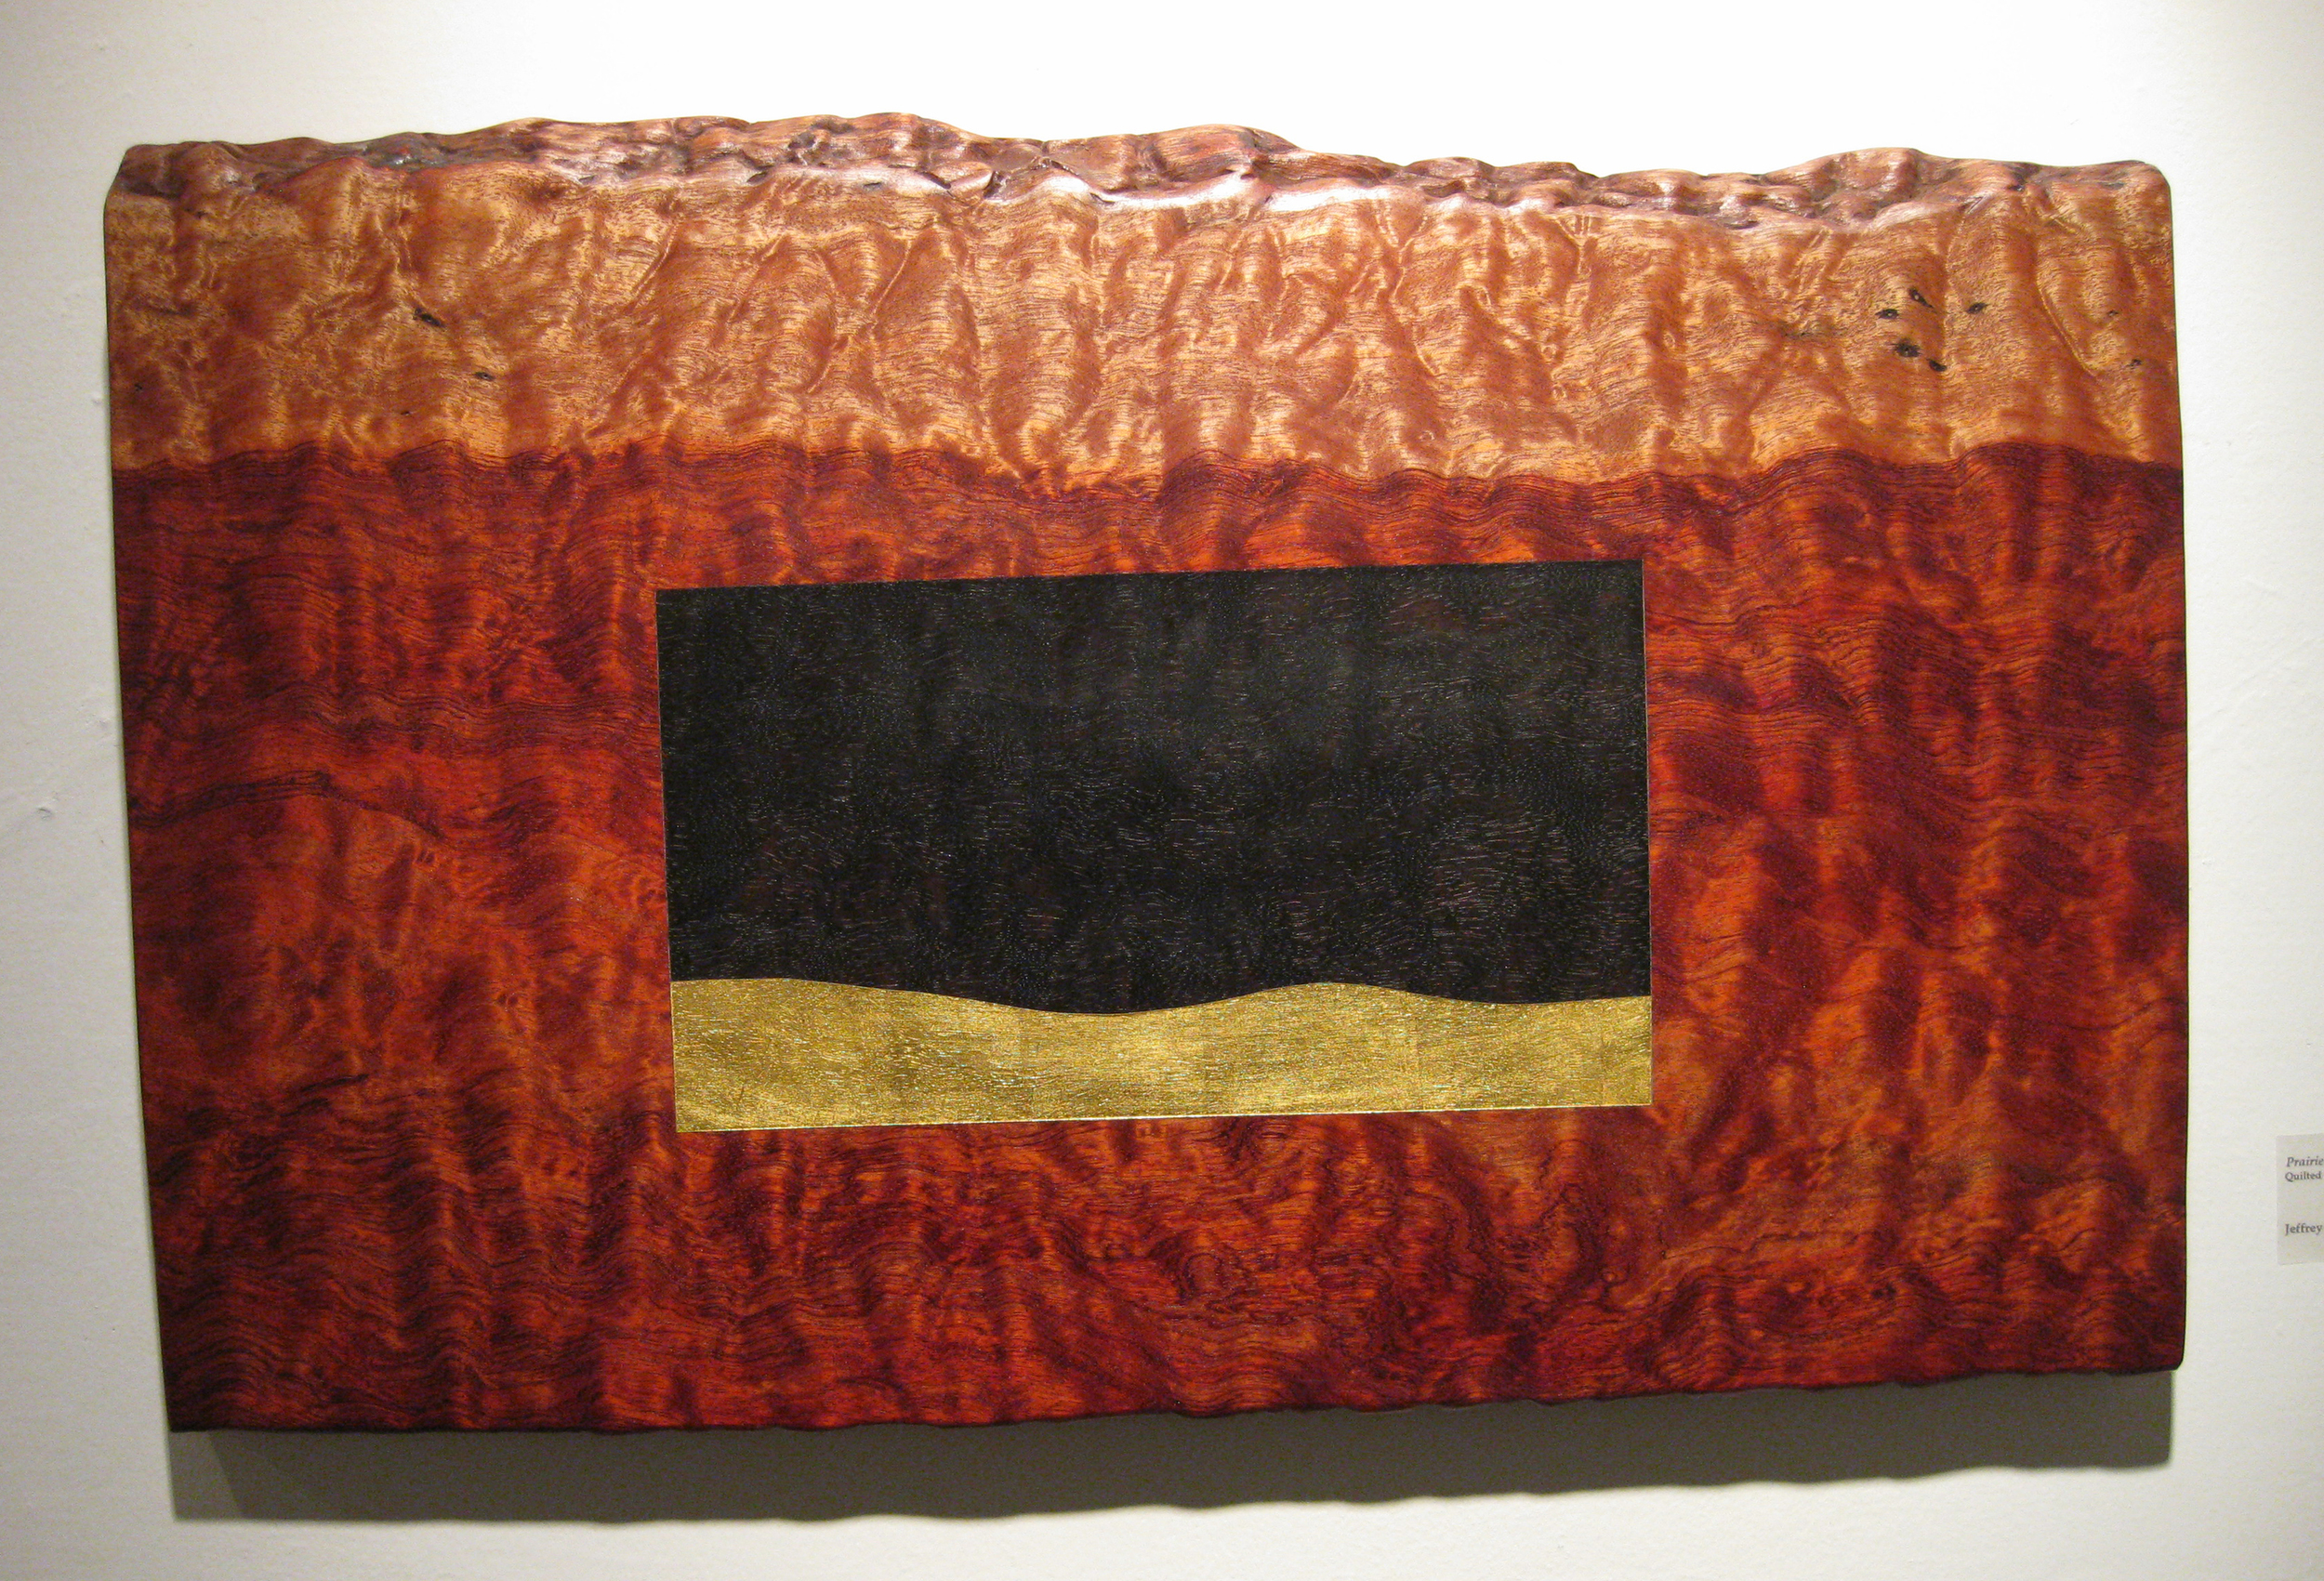 "Prairie Dream  Jeffrey Brosk JB106 Quilted Bubinga, Black Stain, Gold Leaf 19"" x 30"" x 1.5"""